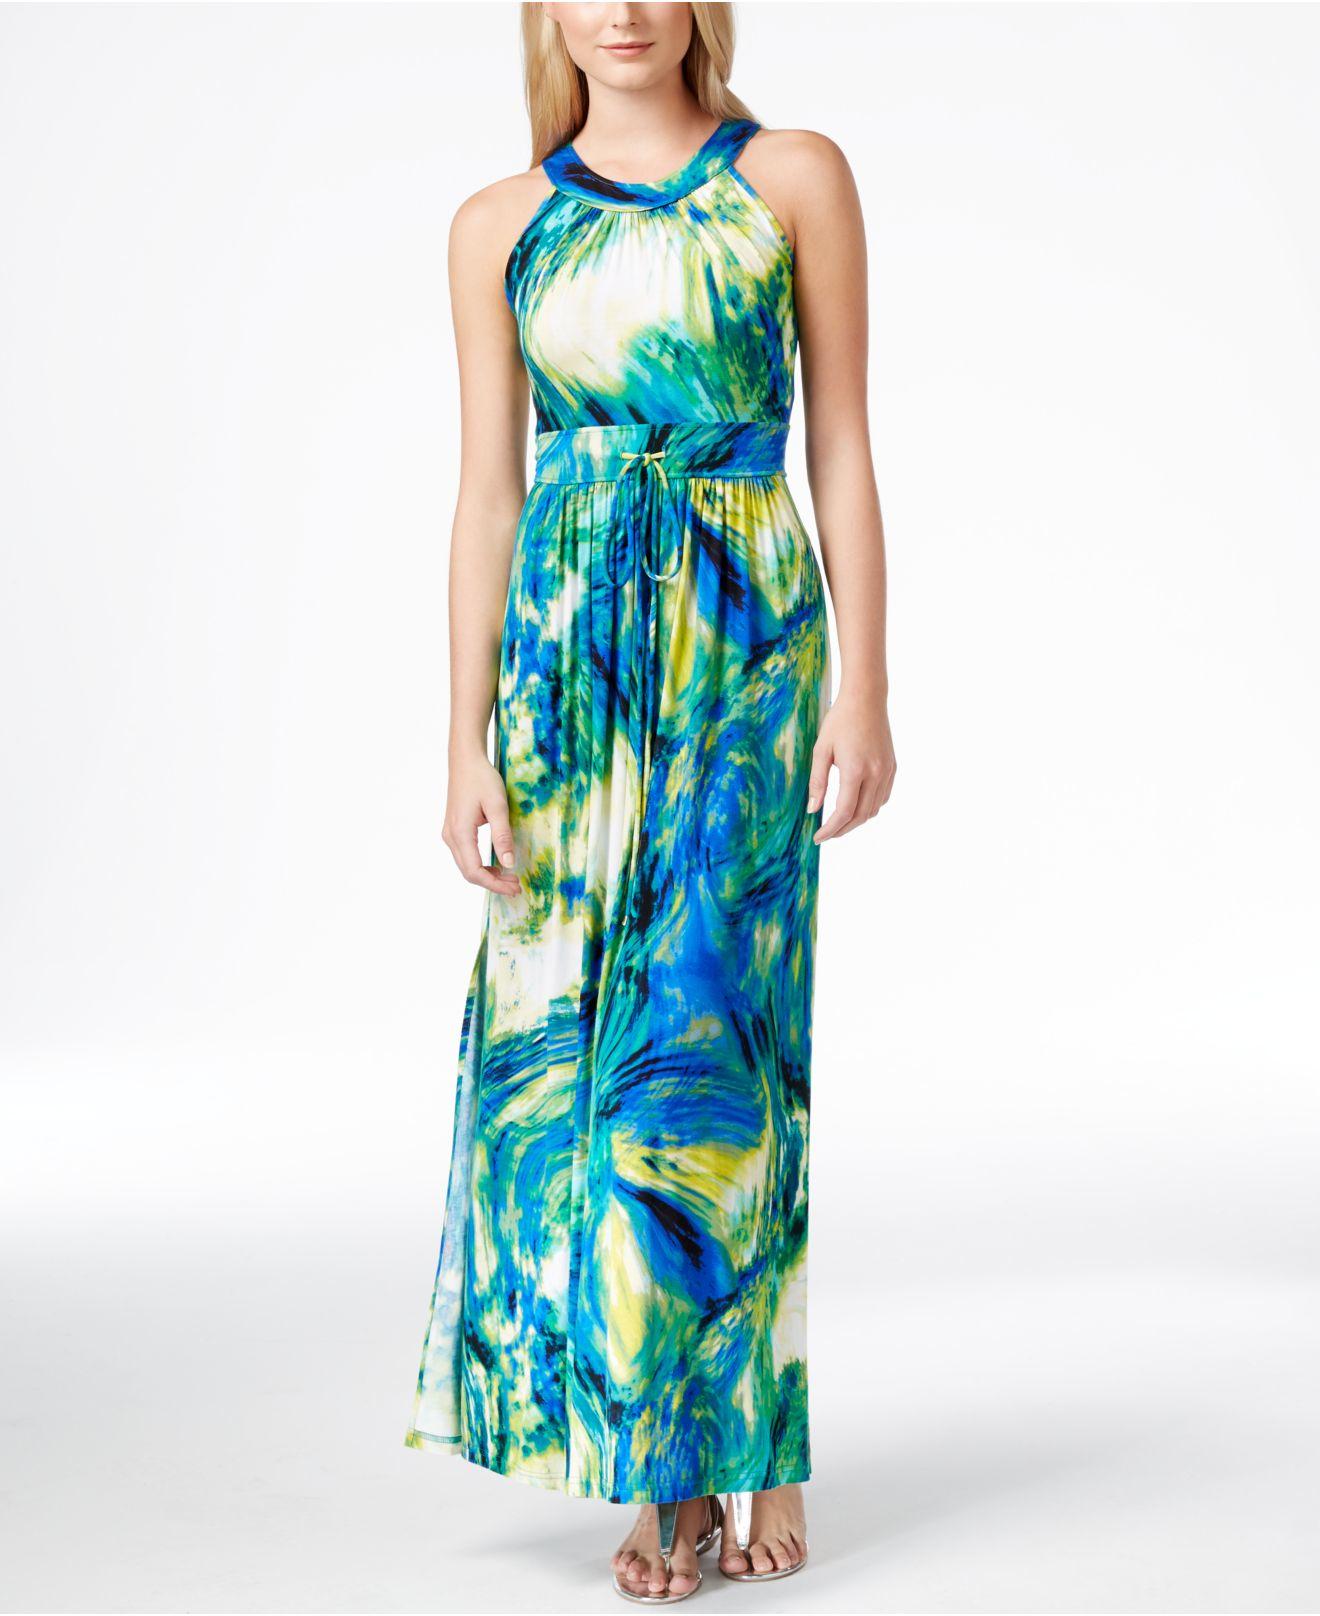 7af82286127 Lyst - Calvin Klein Abstract-painterly-print Halter-neck Maxi Dress ...